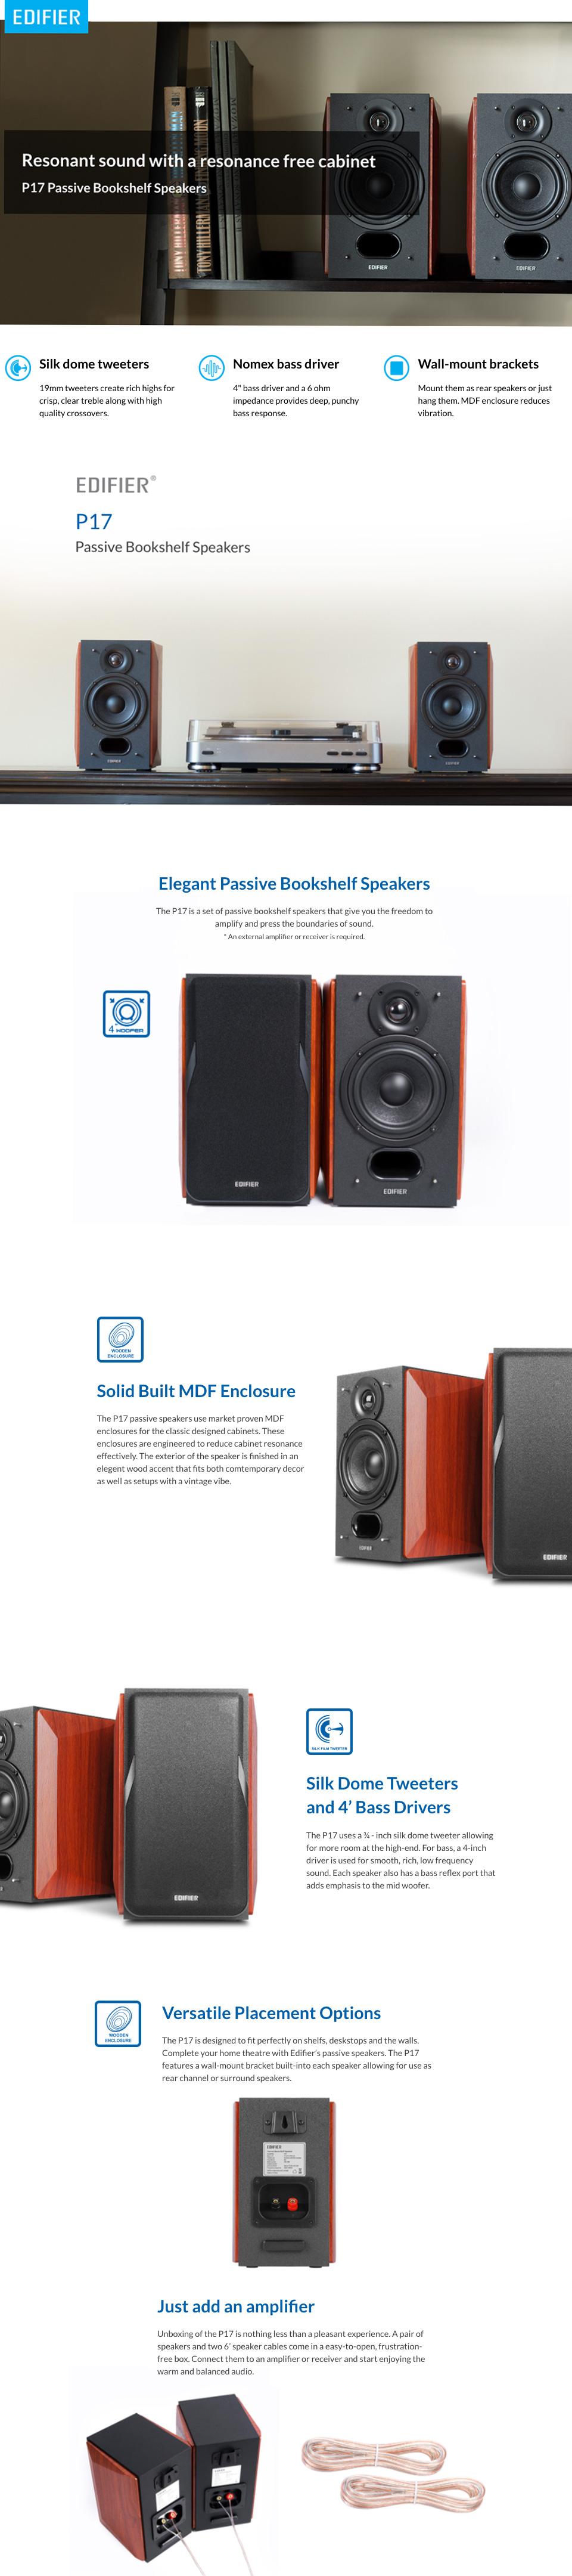 Edifier P17 Premium Wooden Passive Bookshelf Speakers features